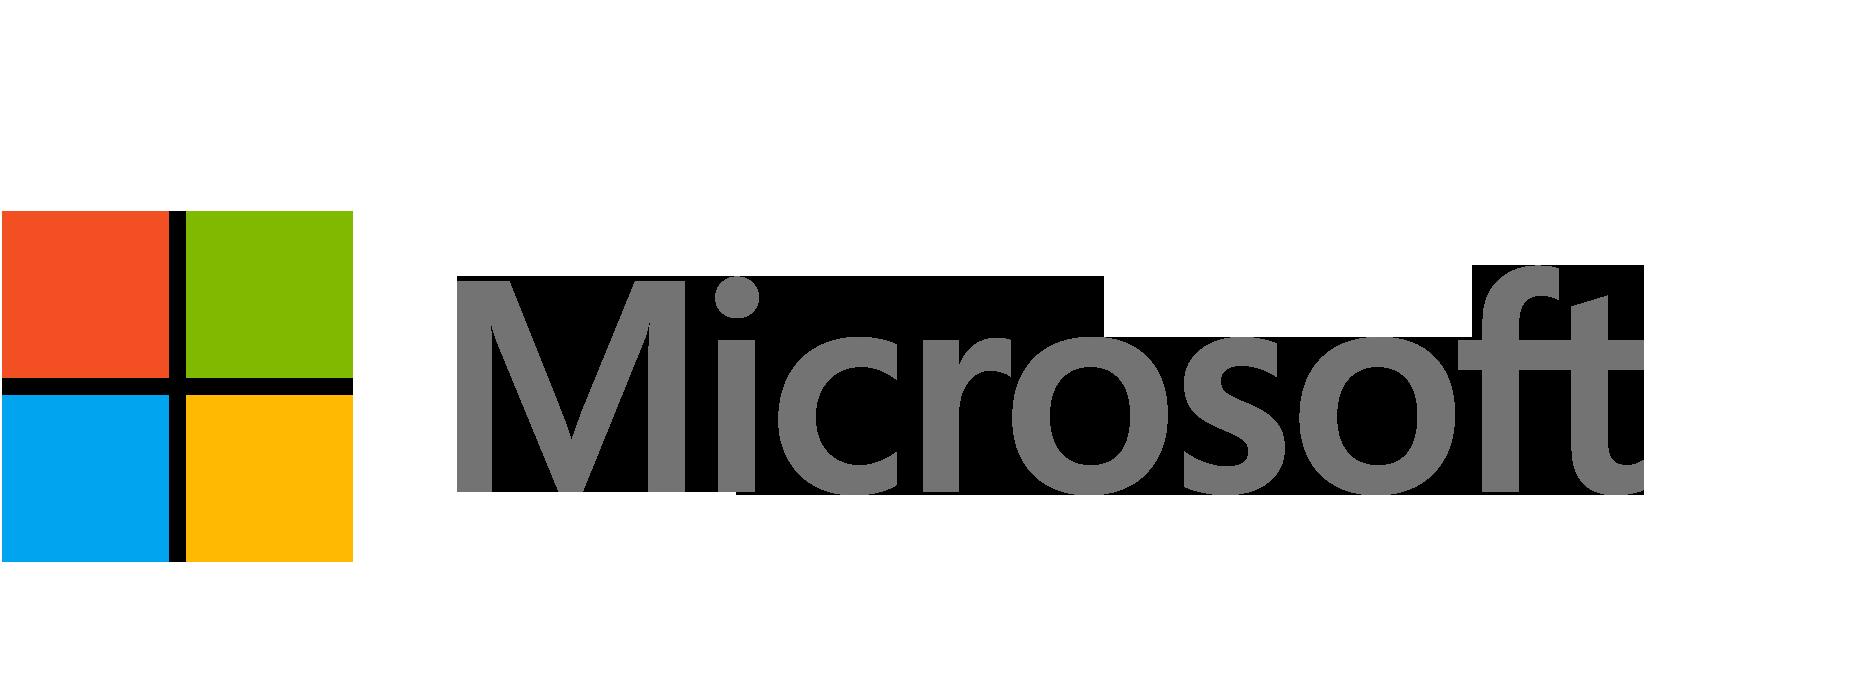 Windows Server RMS CAL - 1 User CAL - 1 year (DG7GMGF0DVT0)